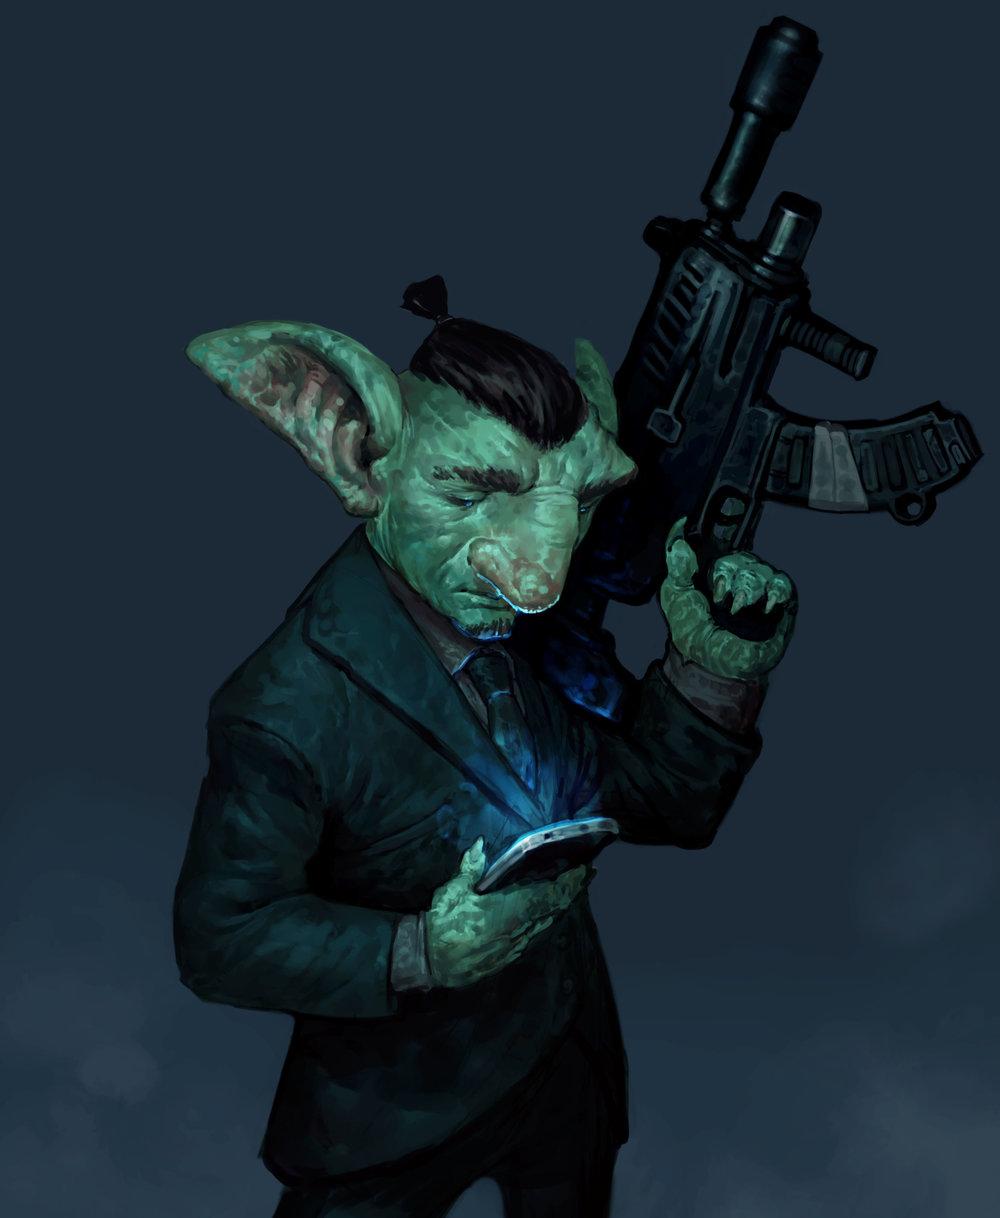 """Goblin inspired by John Wick 2"""